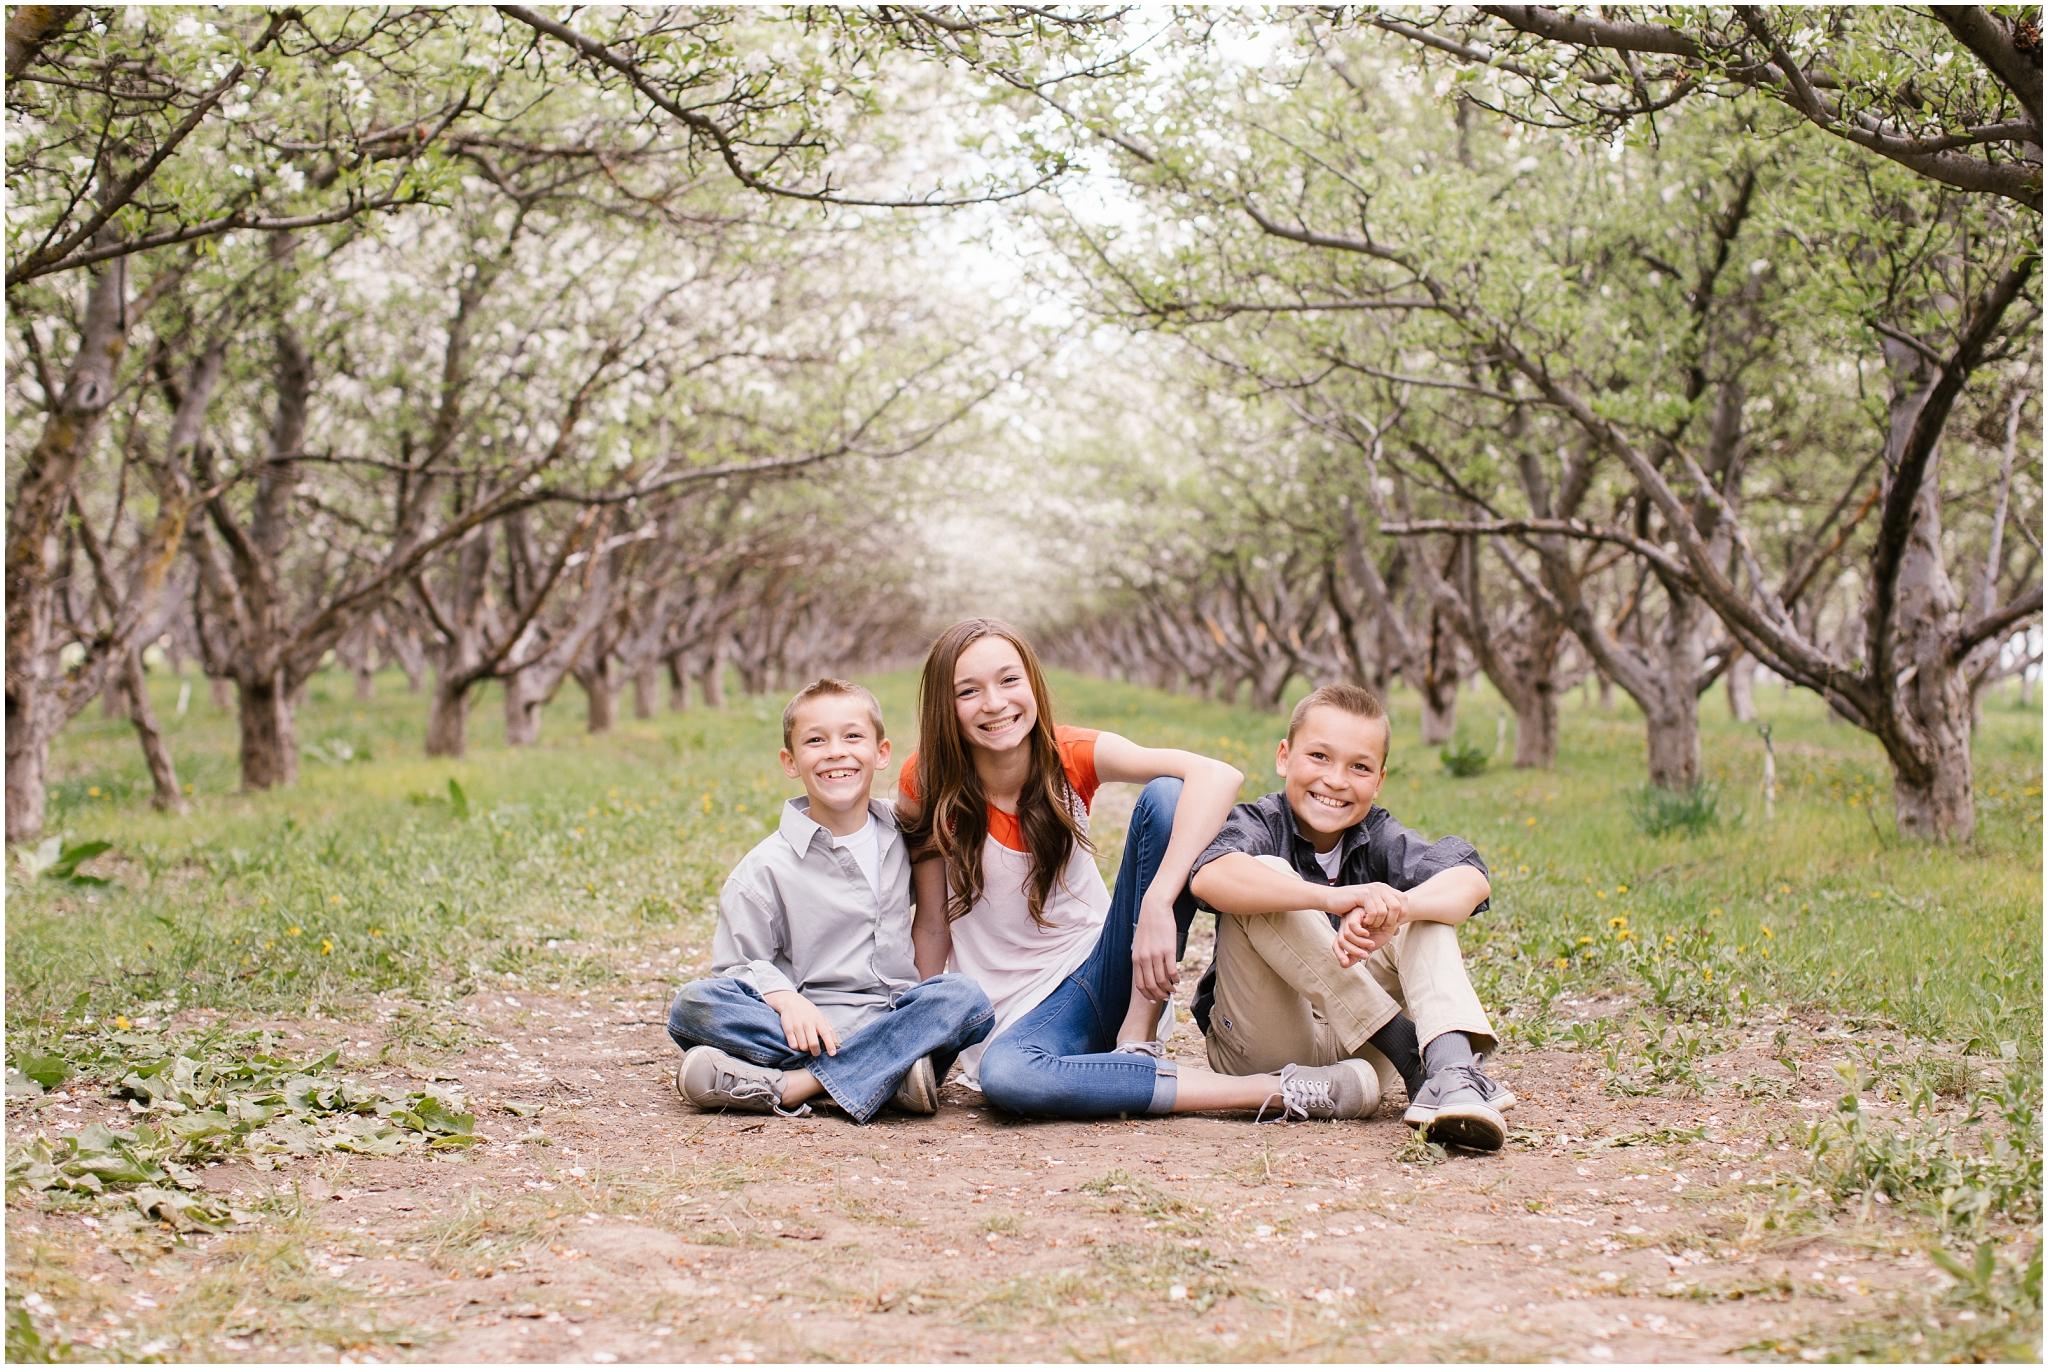 392-Millar-133-_Lizzie-B-Imagery-Utah-Family-Photographer-Salt-Lake-City-Park-City-utah-state-hospital.jpg